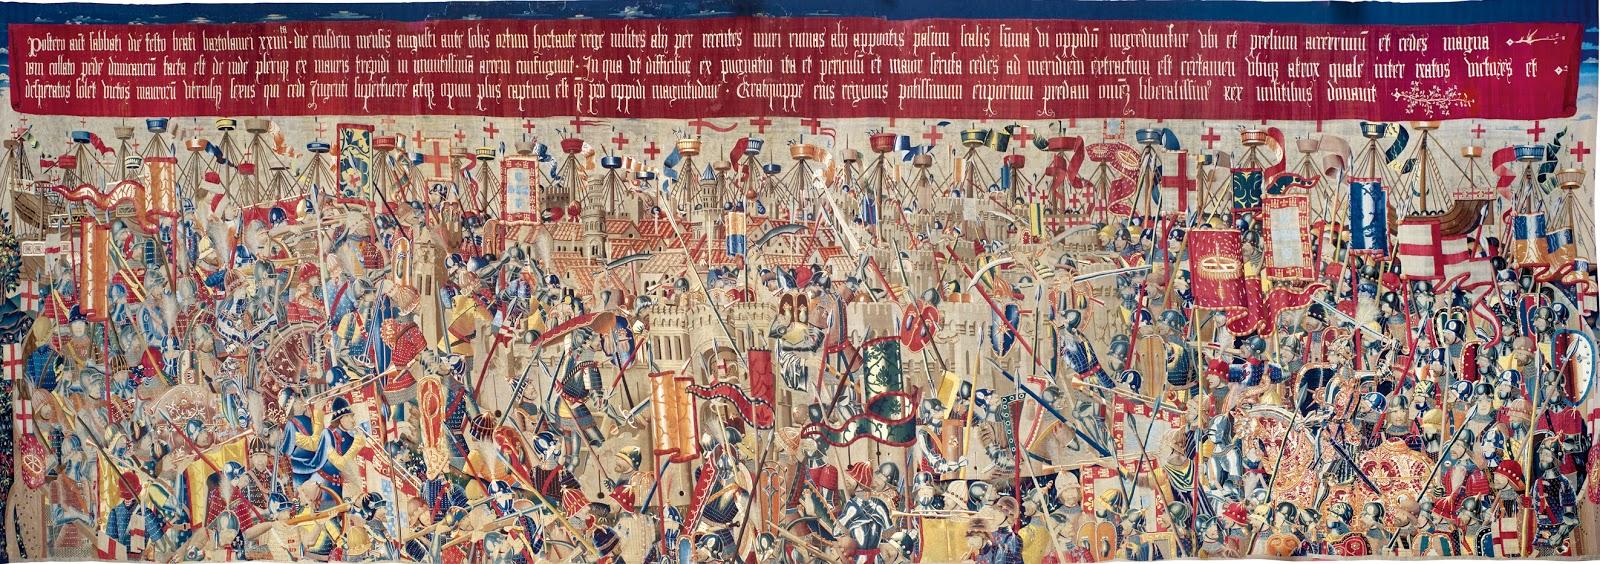 Los tapices de Pastrana. Siglo XV  3